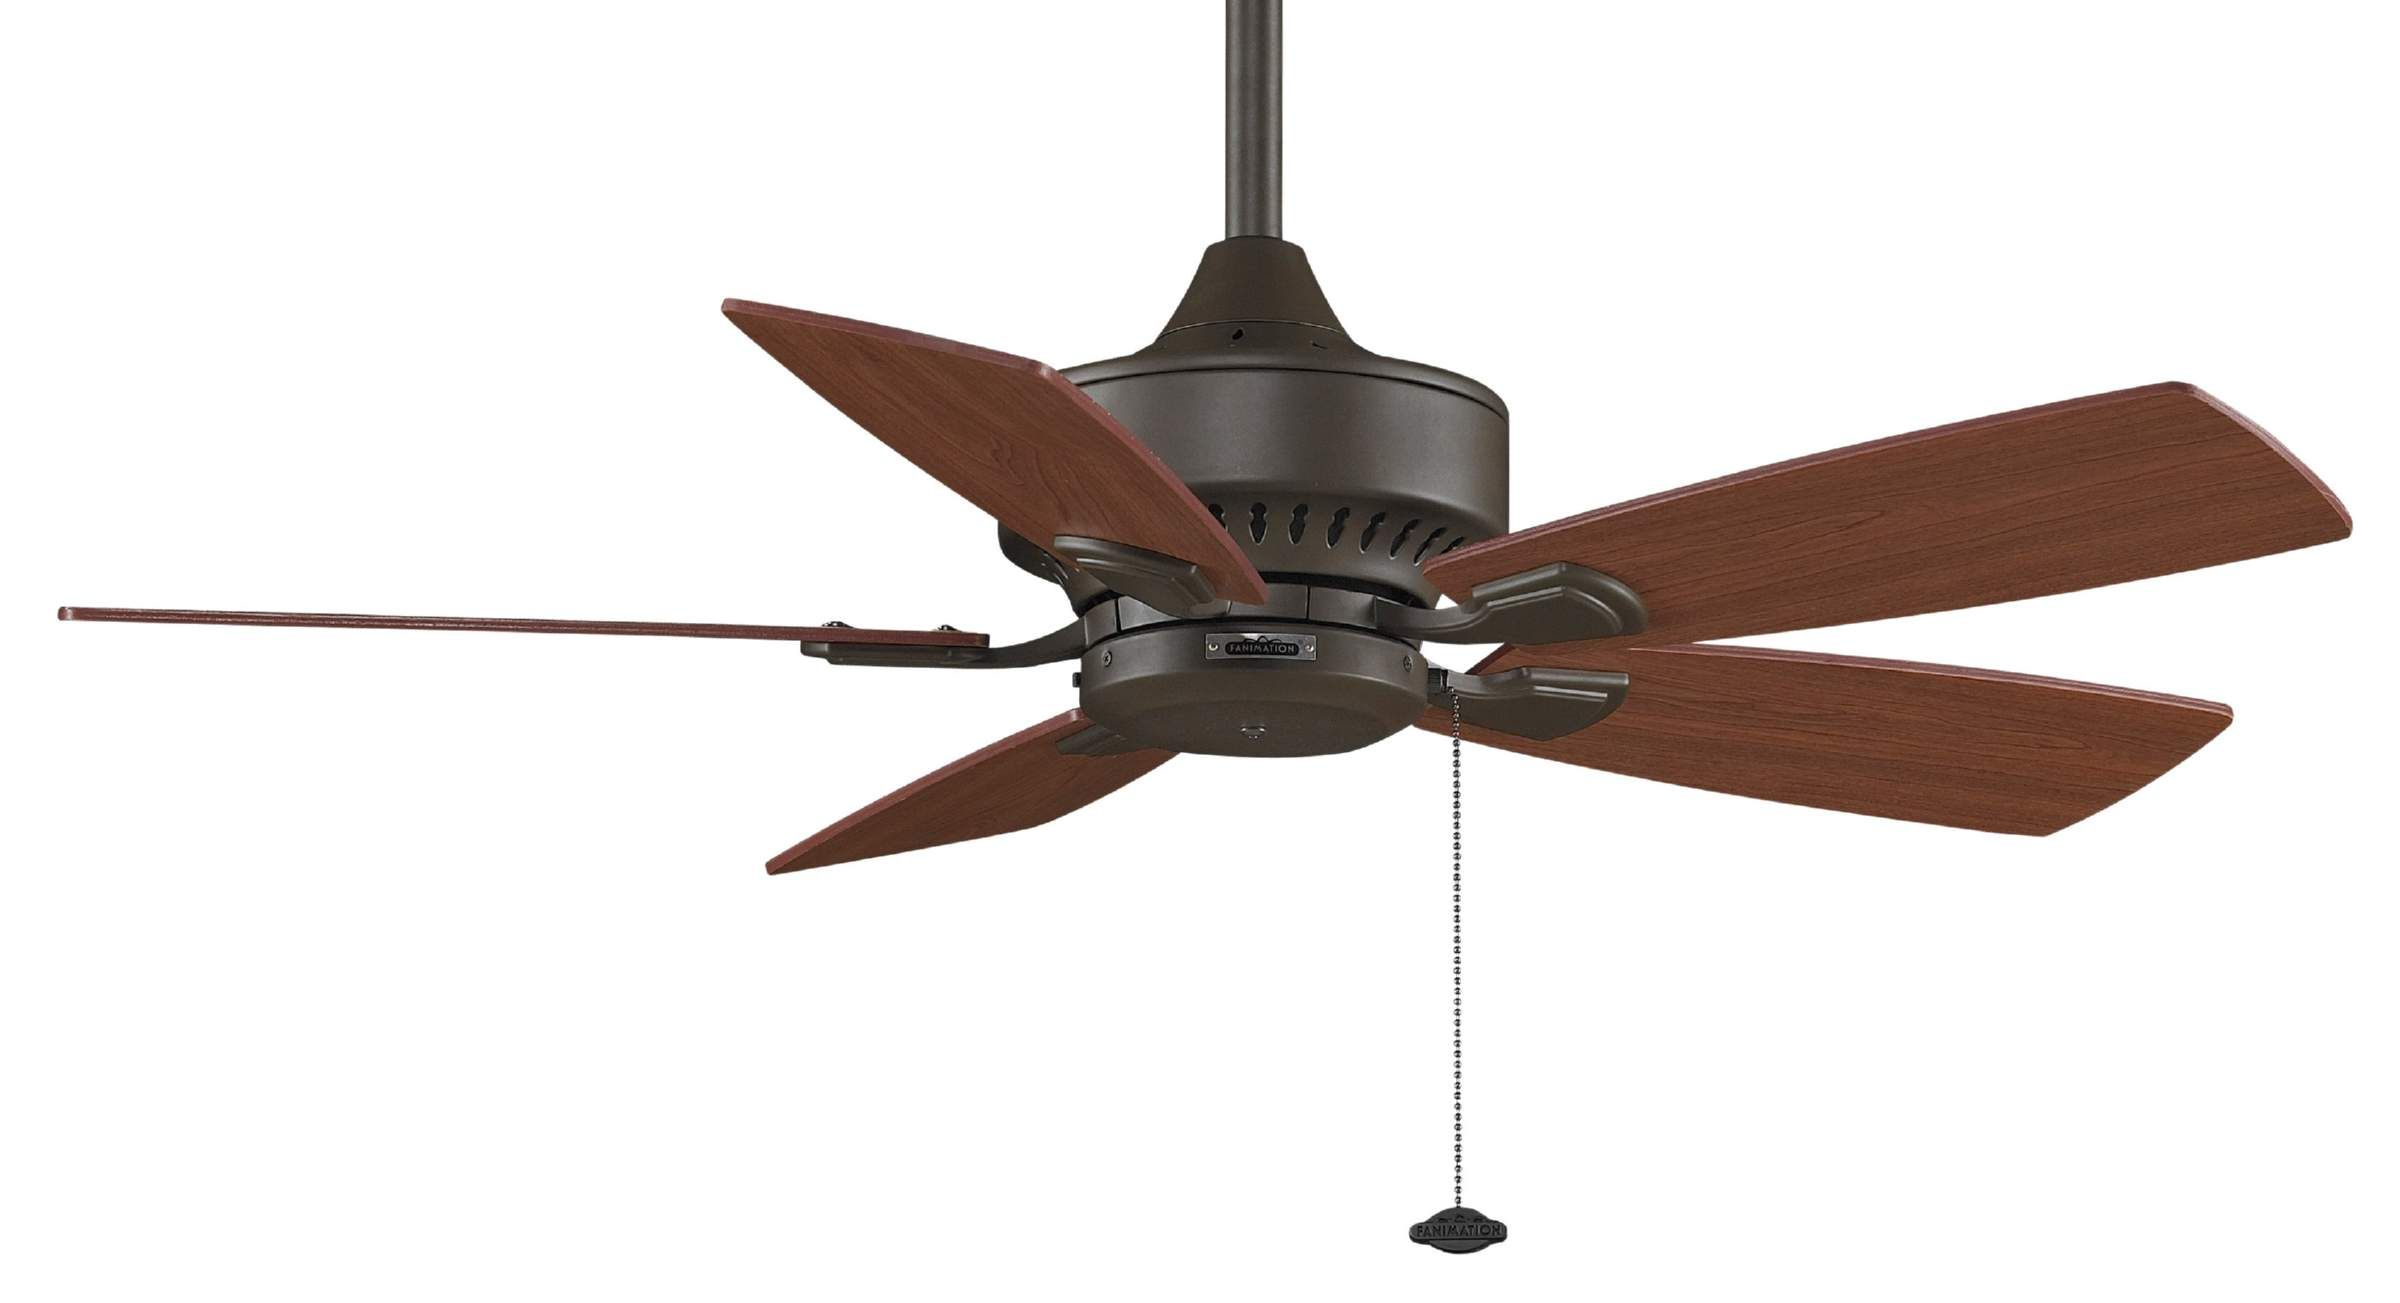 fanimation cancun 42 fp8042ob airflow rating 3943 cfm cubic feet per minute bronze ceiling fan kensgrove 72